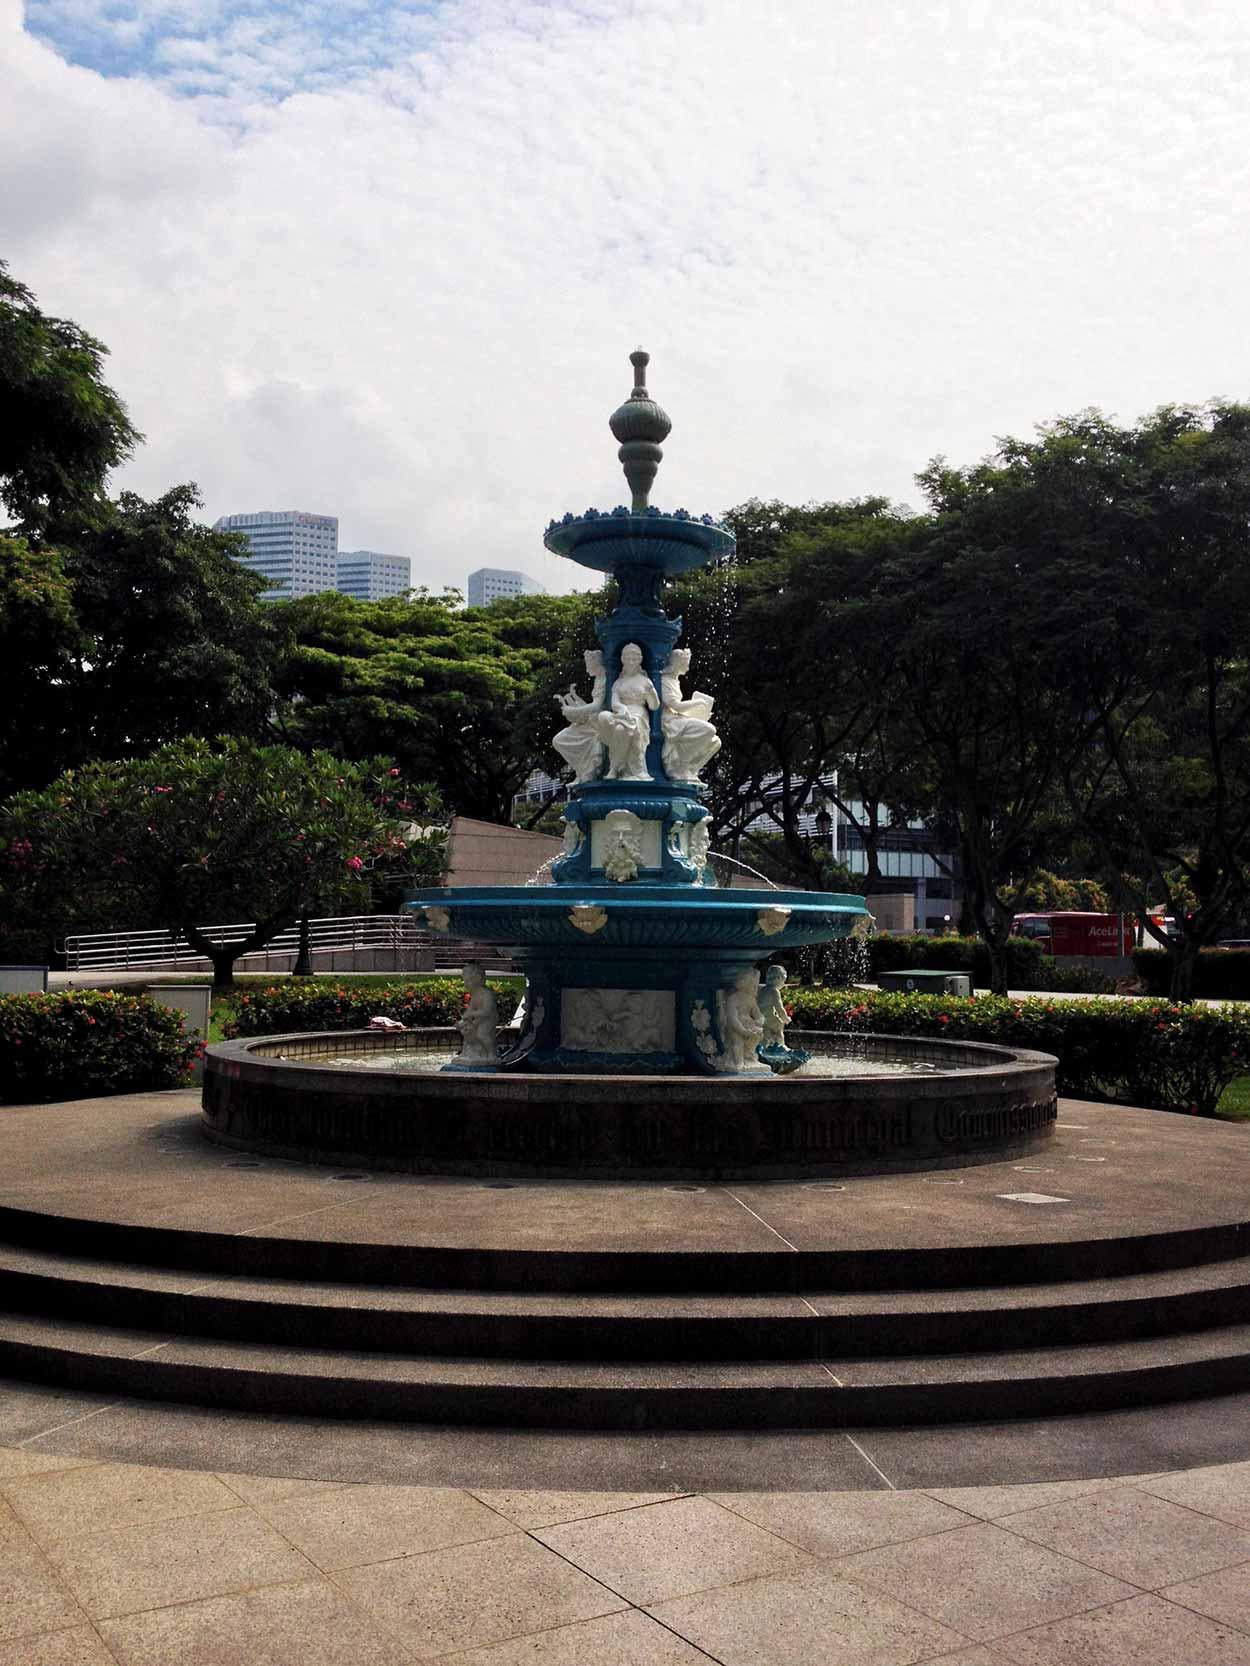 The Tan Kim Seng Fountain in Esplanade Park, Colonial District, Singapore